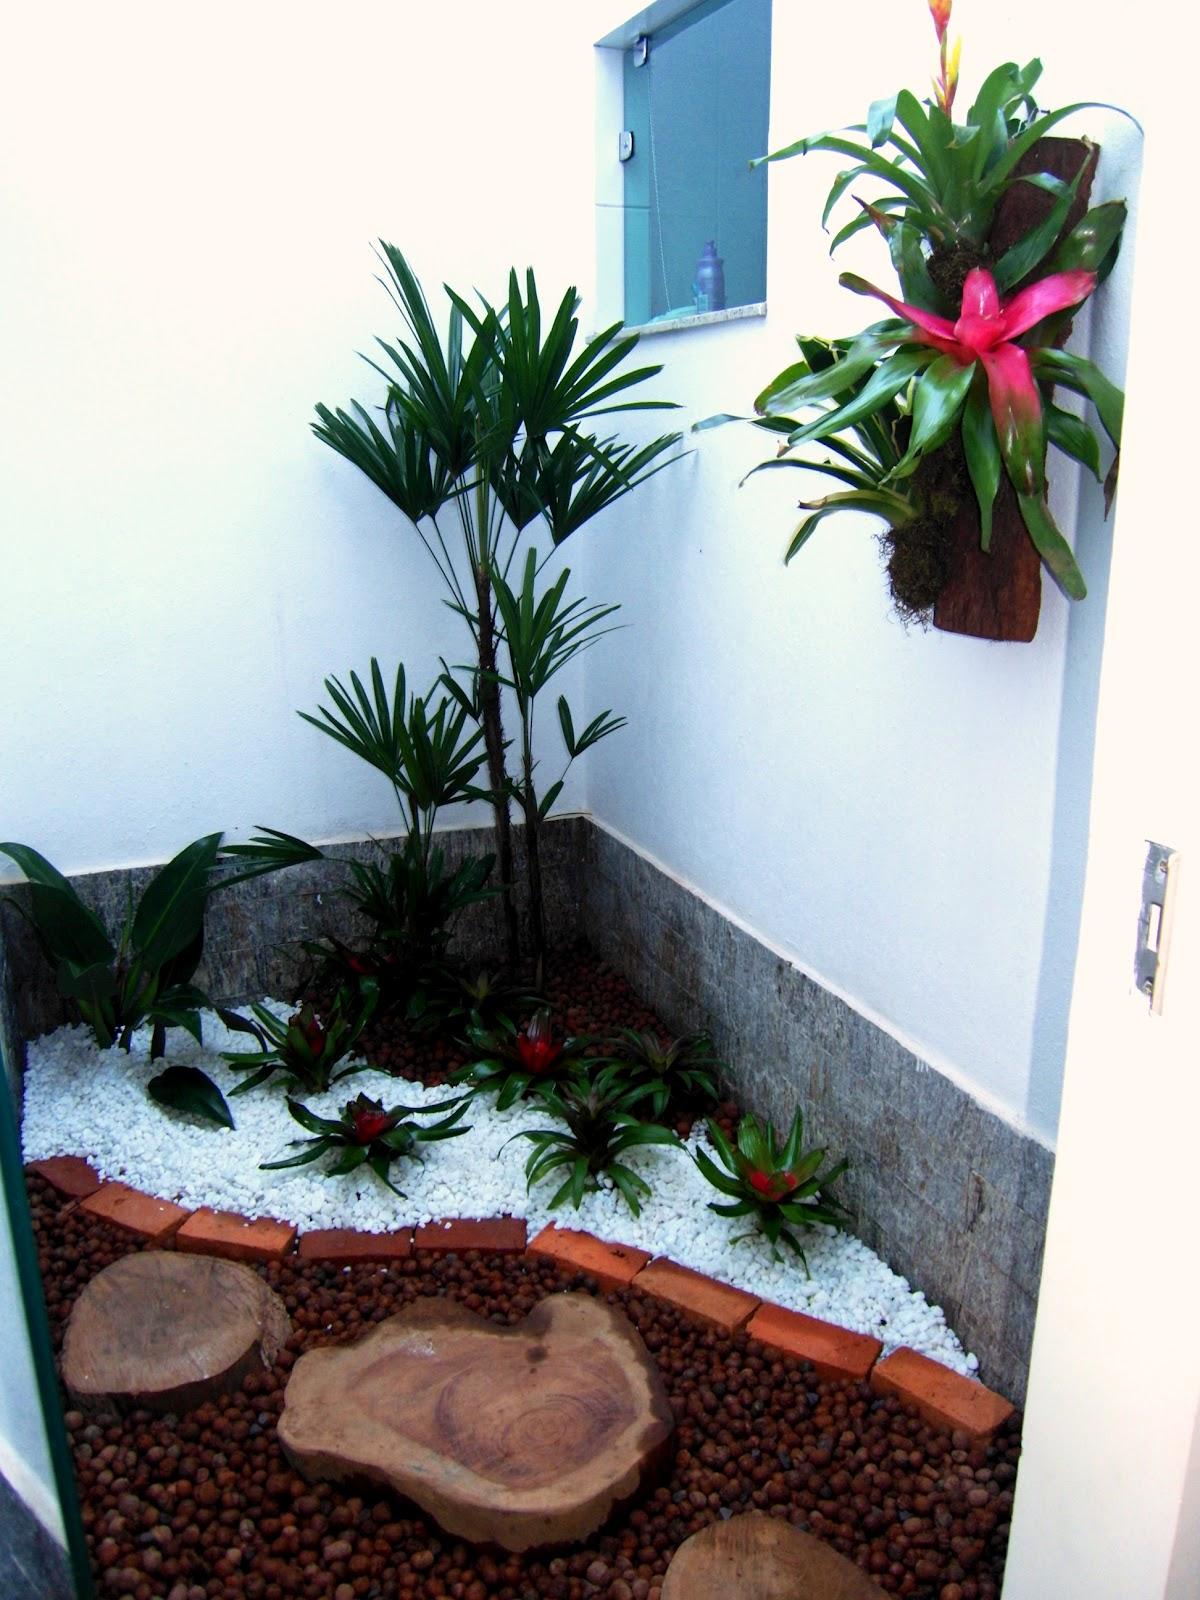 flores jardim de inverno : flores jardim de inverno:Claraboia vira um jardim de inverno, com especies de sombra, pacova